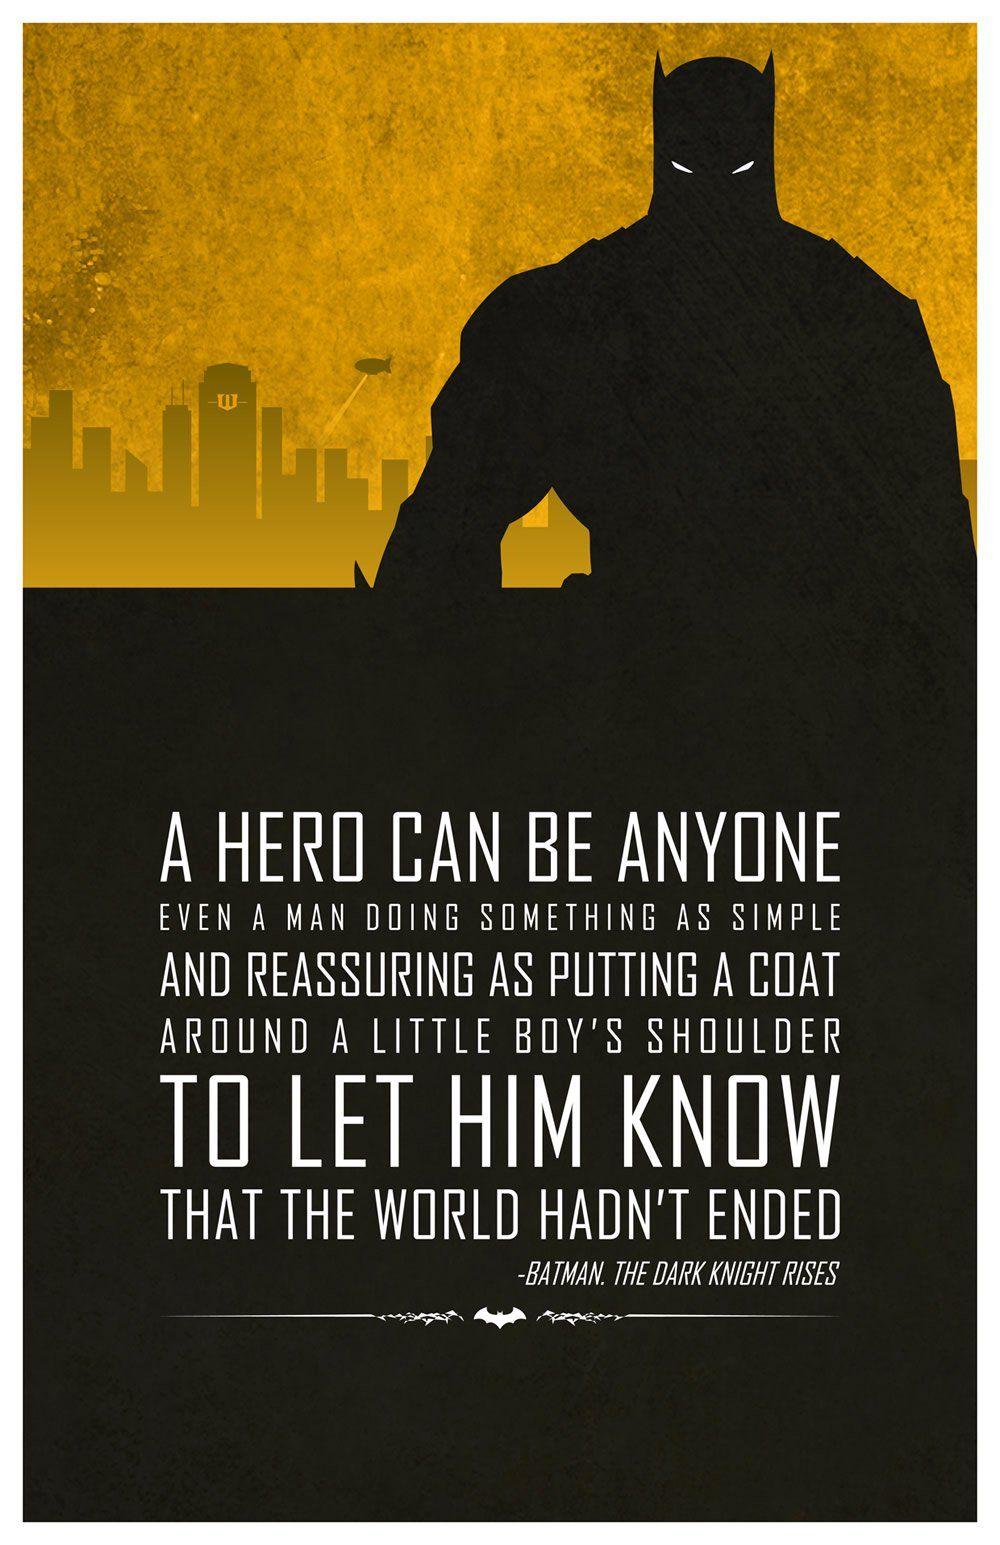 Save the world quotes quotesgram - Superhero Hero Quotes Quotesgram By Quotesgram